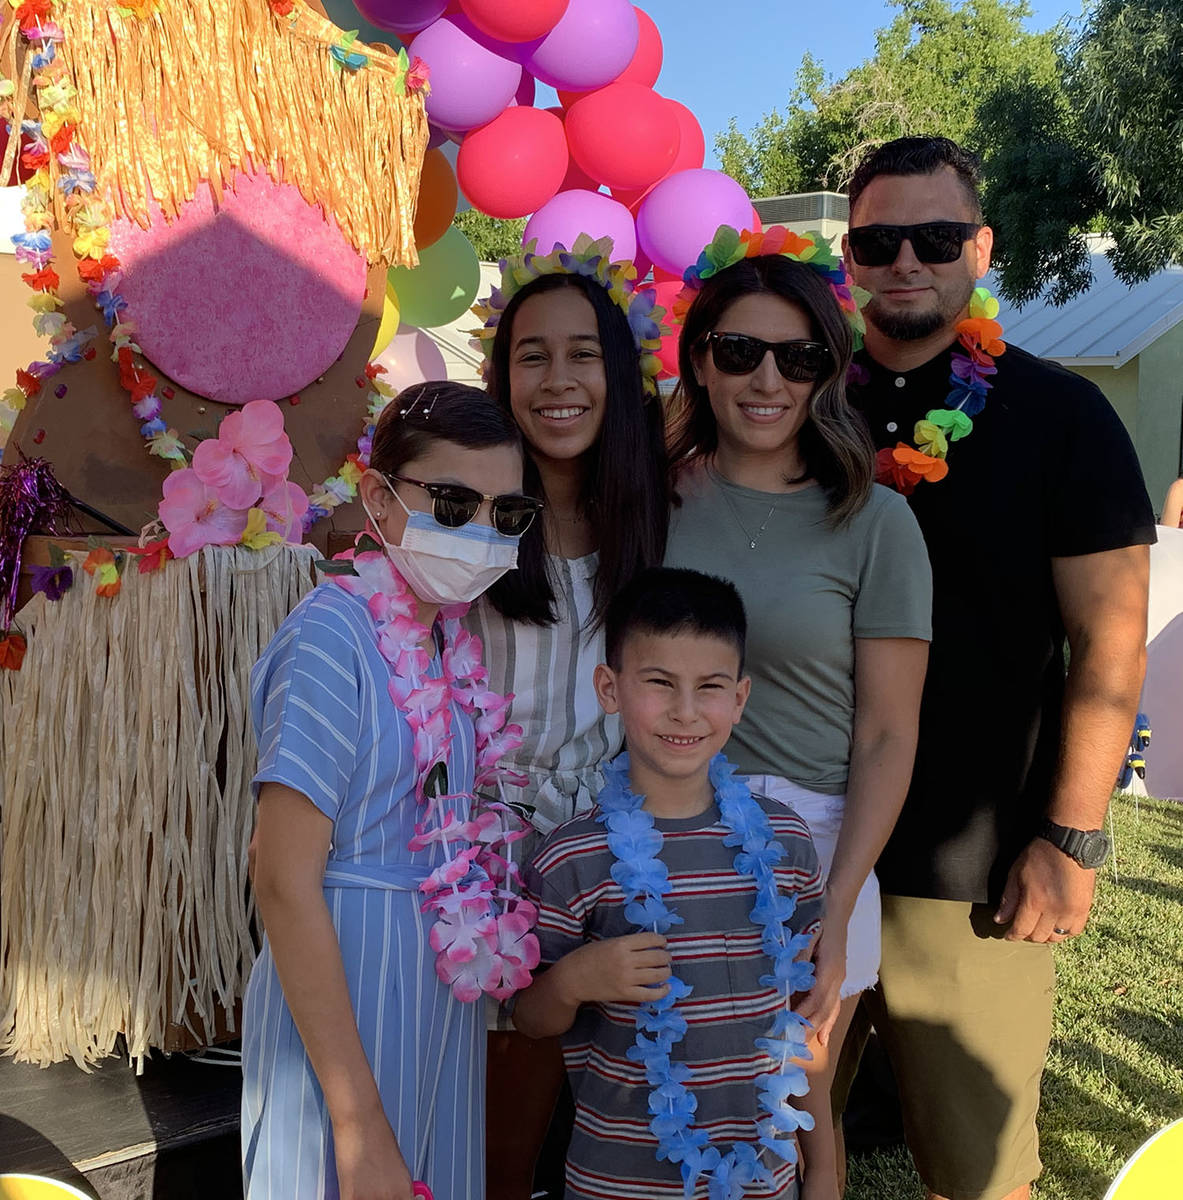 (Hali Bernstein Saylor/Boulder City Review) The Giamanco family, from left, Emilee, Natalee, Pr ...